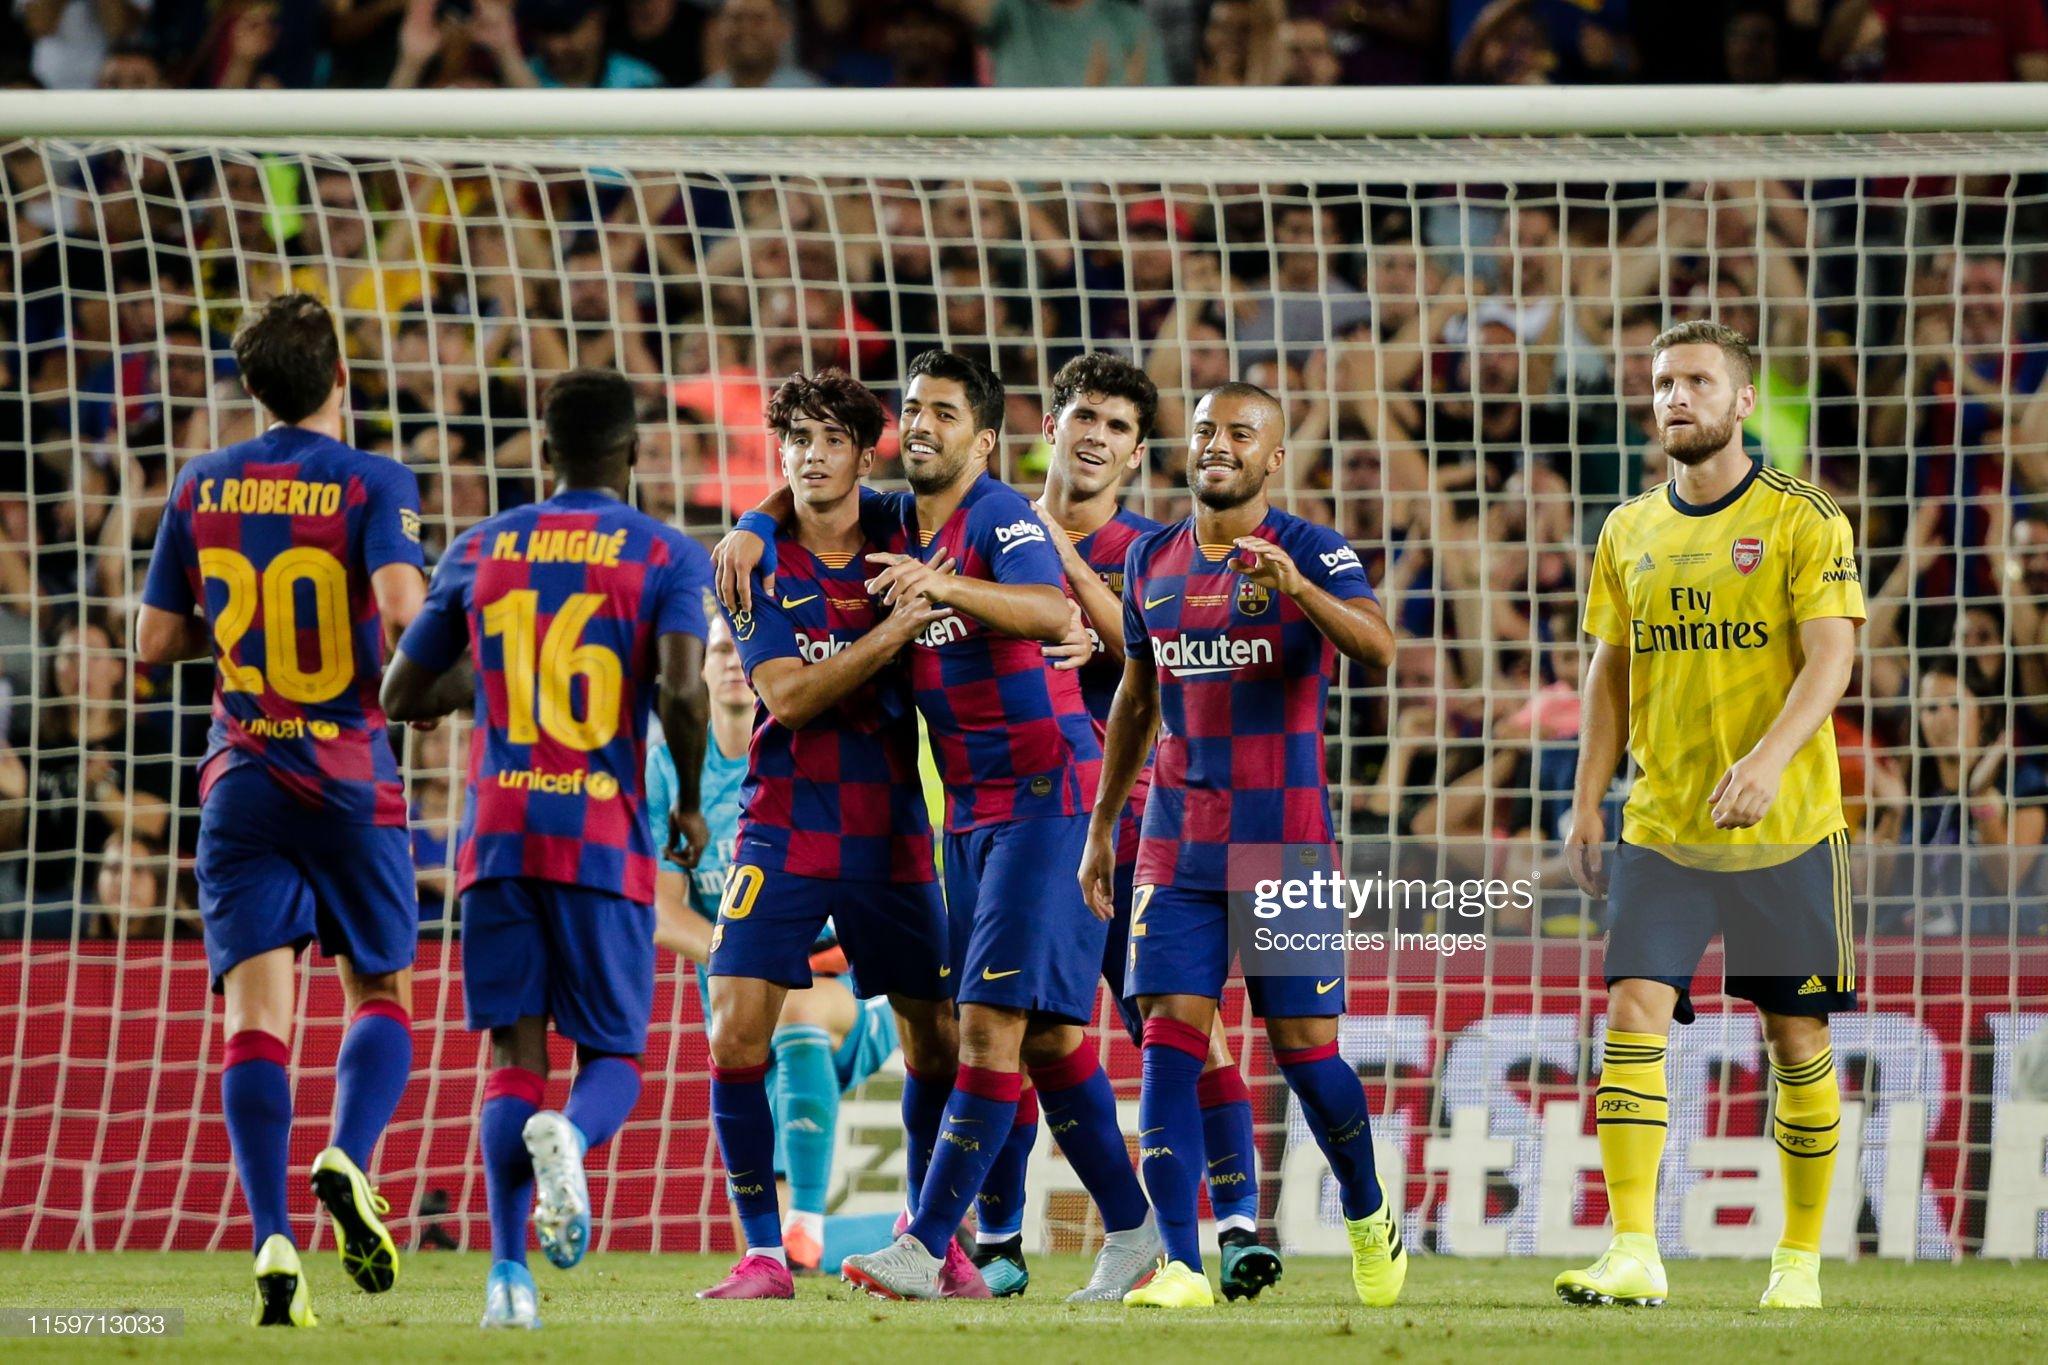 FC Barcelona v Arsenal - Club Friendly : News Photo